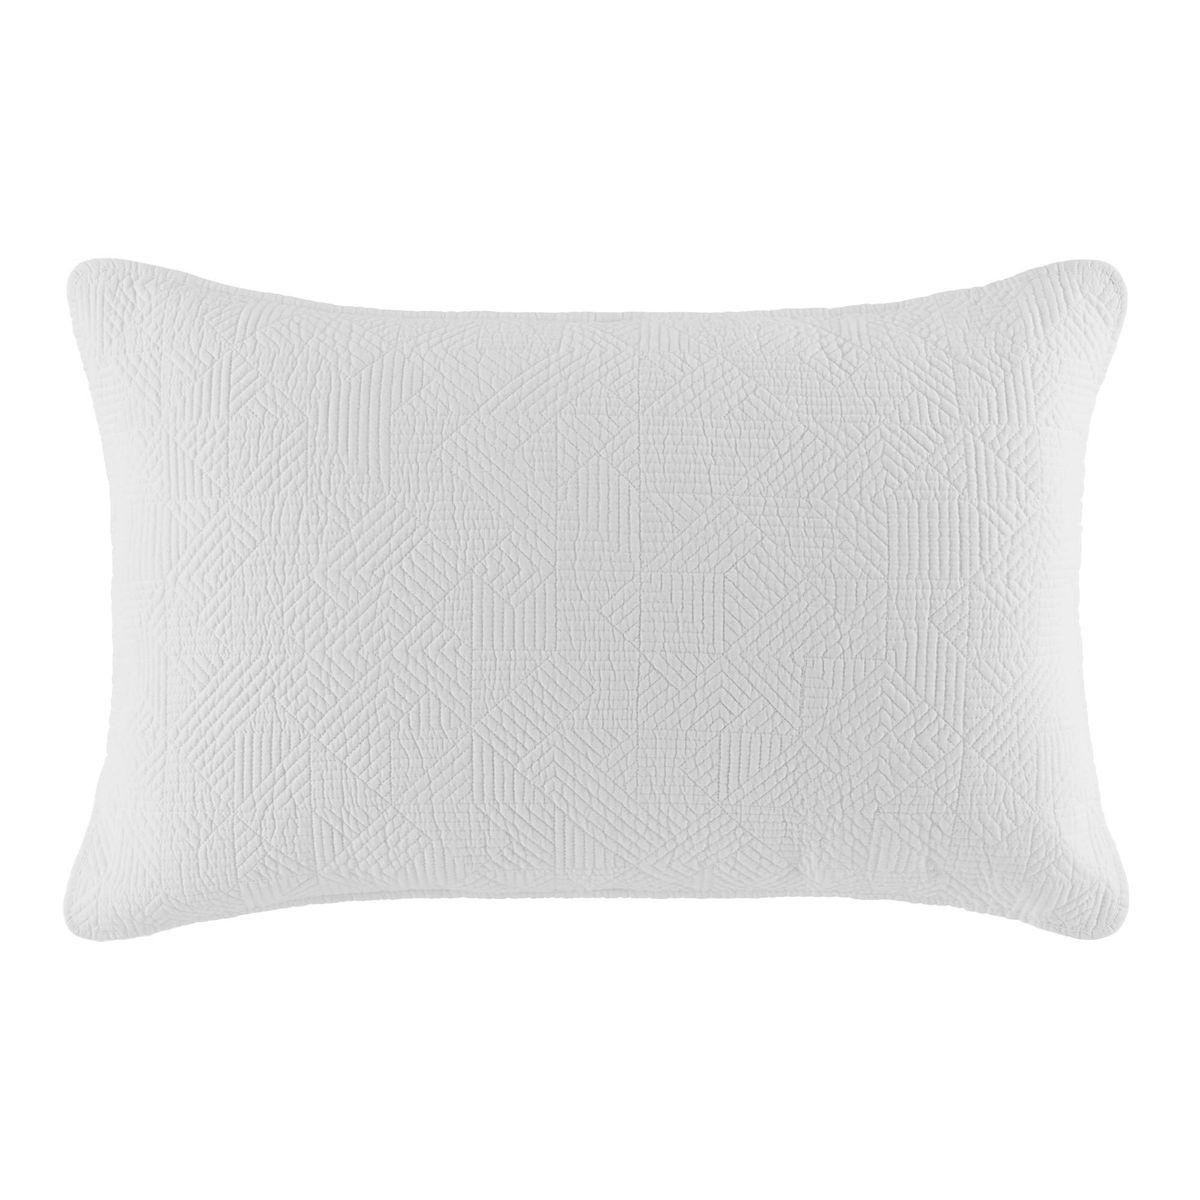 Enveloppe de coussin Coton THEOREME Blanc